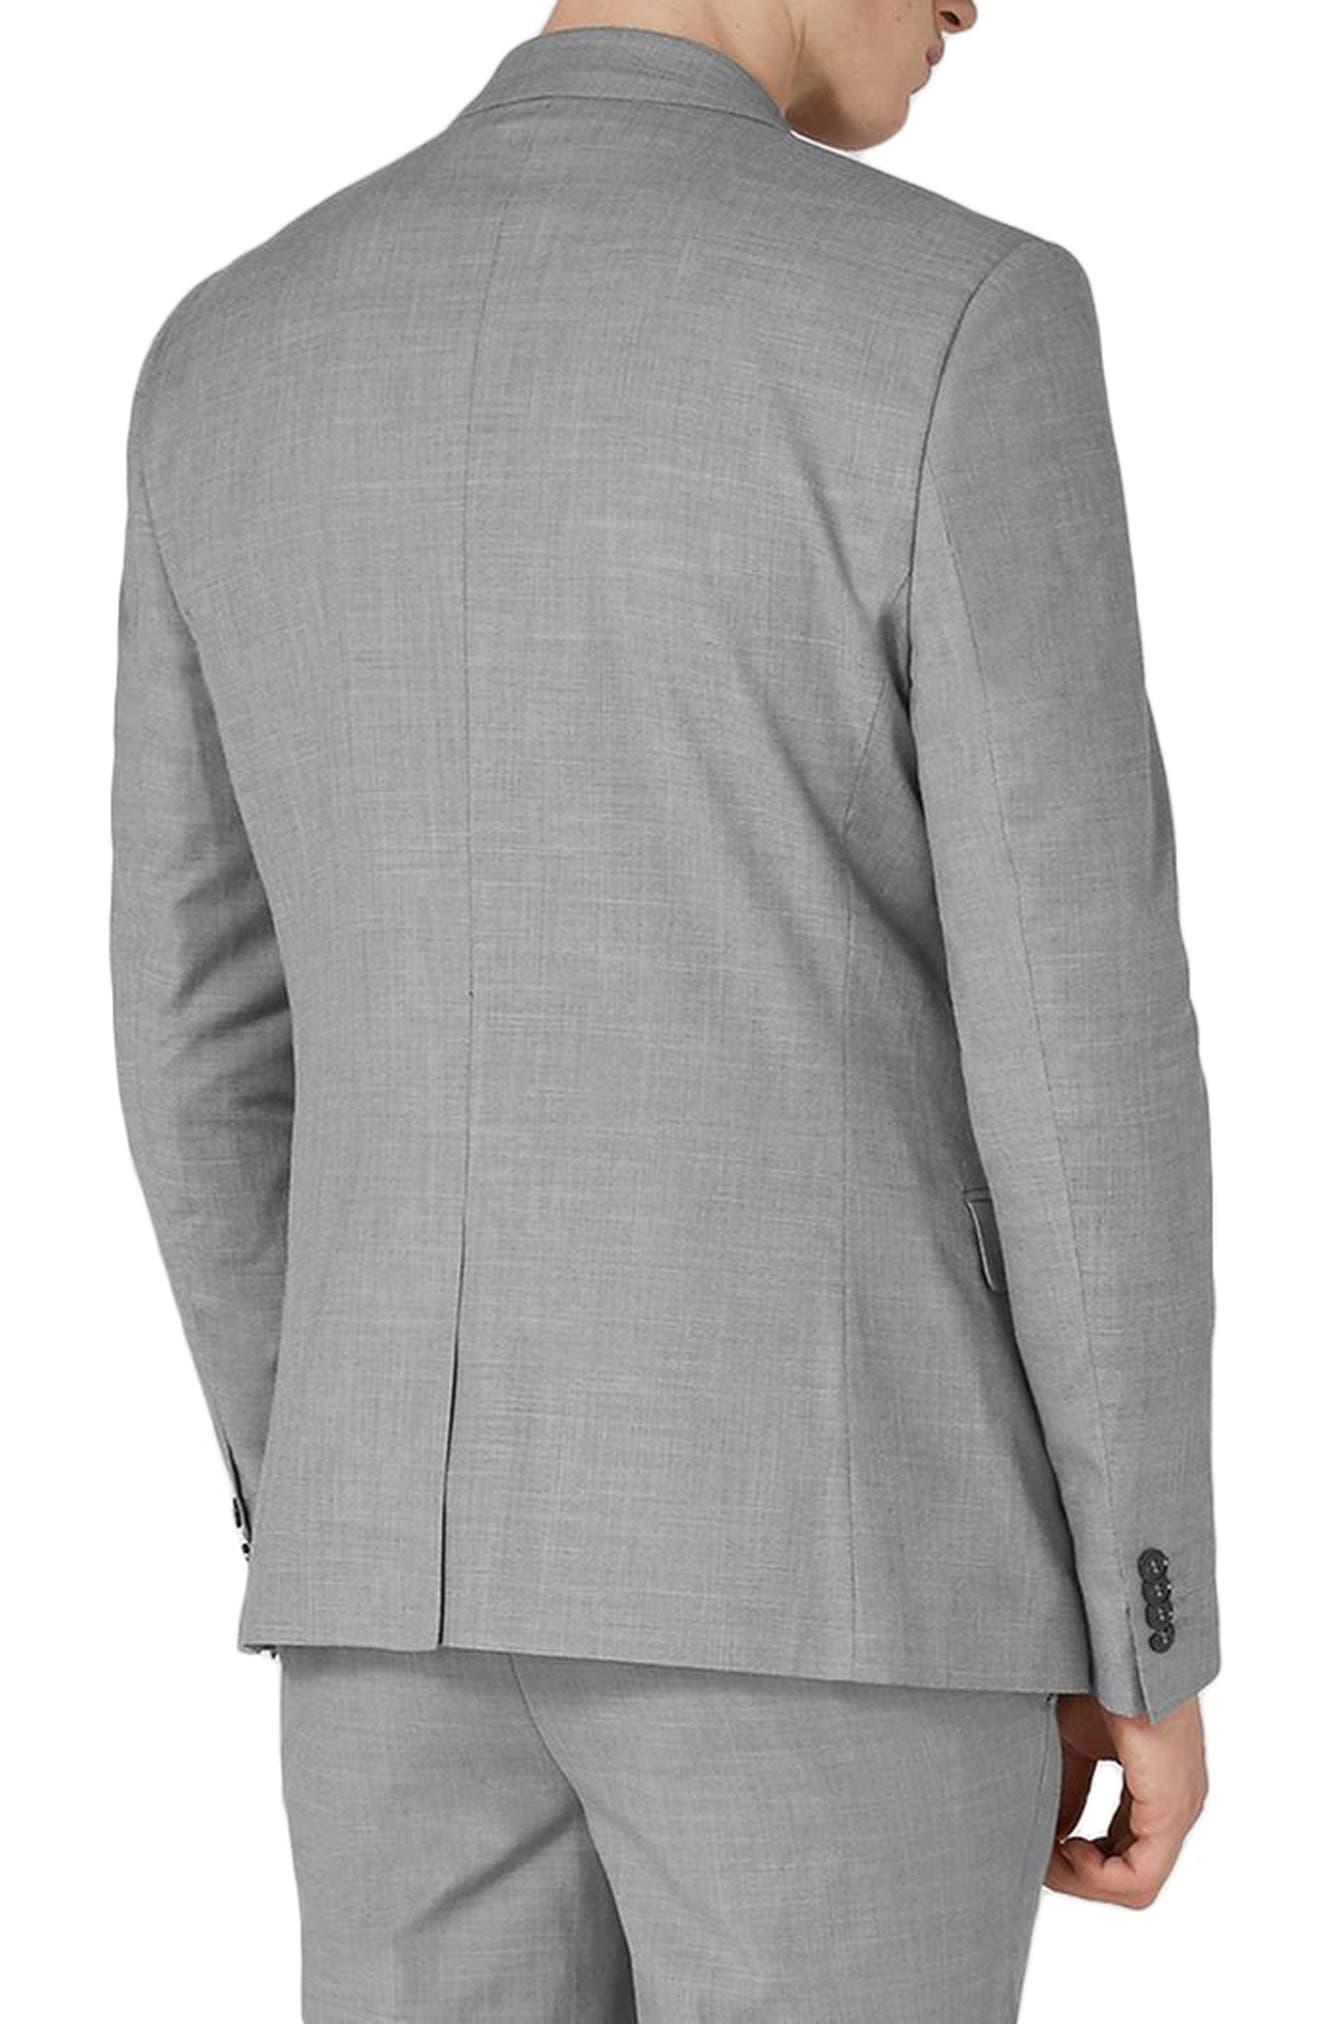 TOPMAN, Skinny Fit Suit Jacket, Alternate thumbnail 2, color, GREY